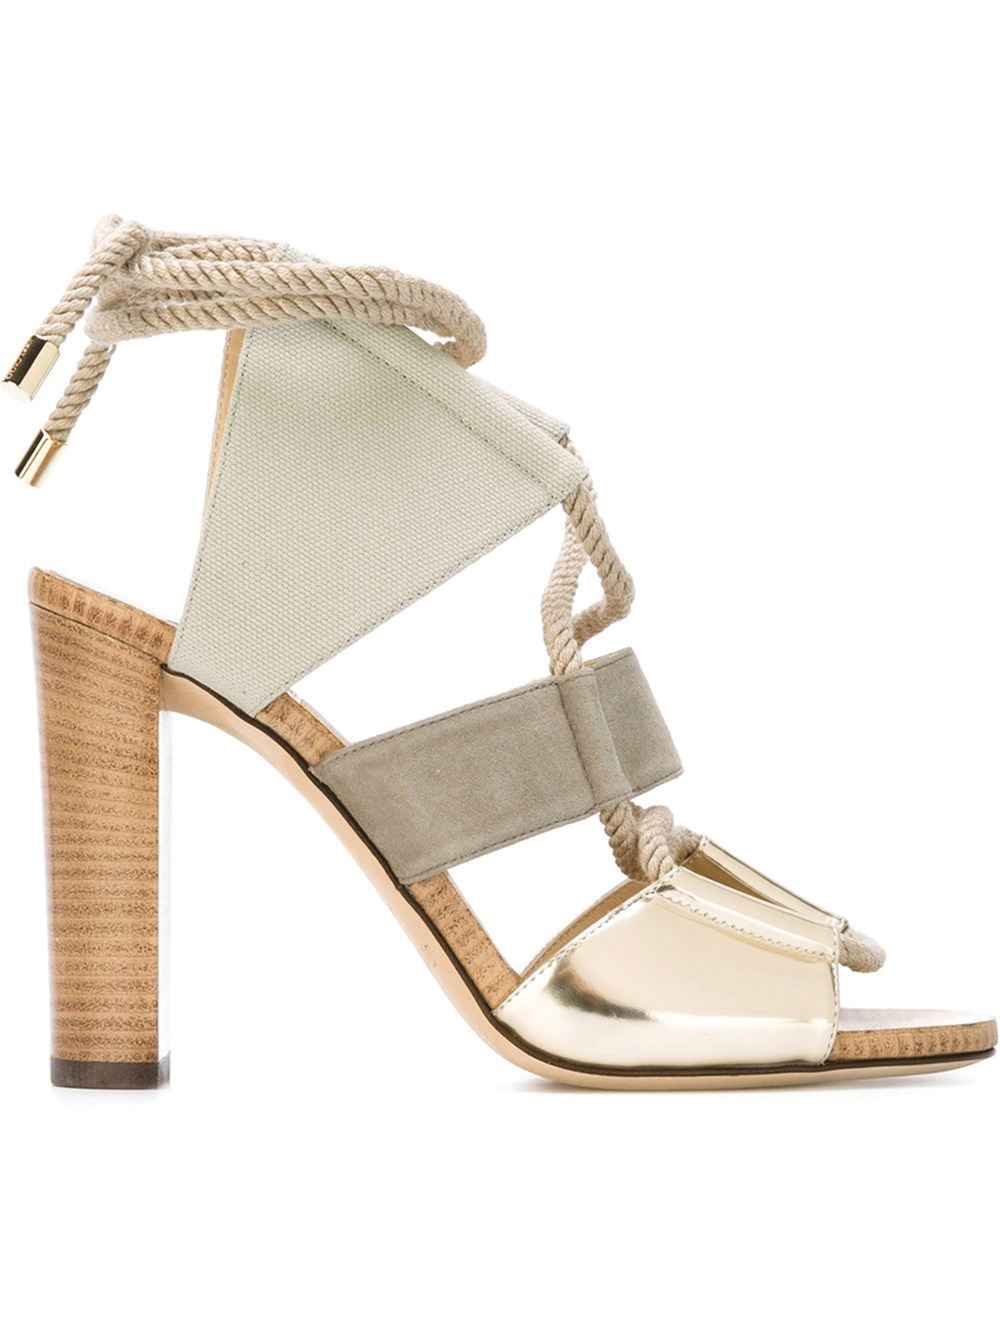 Jimmy Choo Henni Sandals $1,218